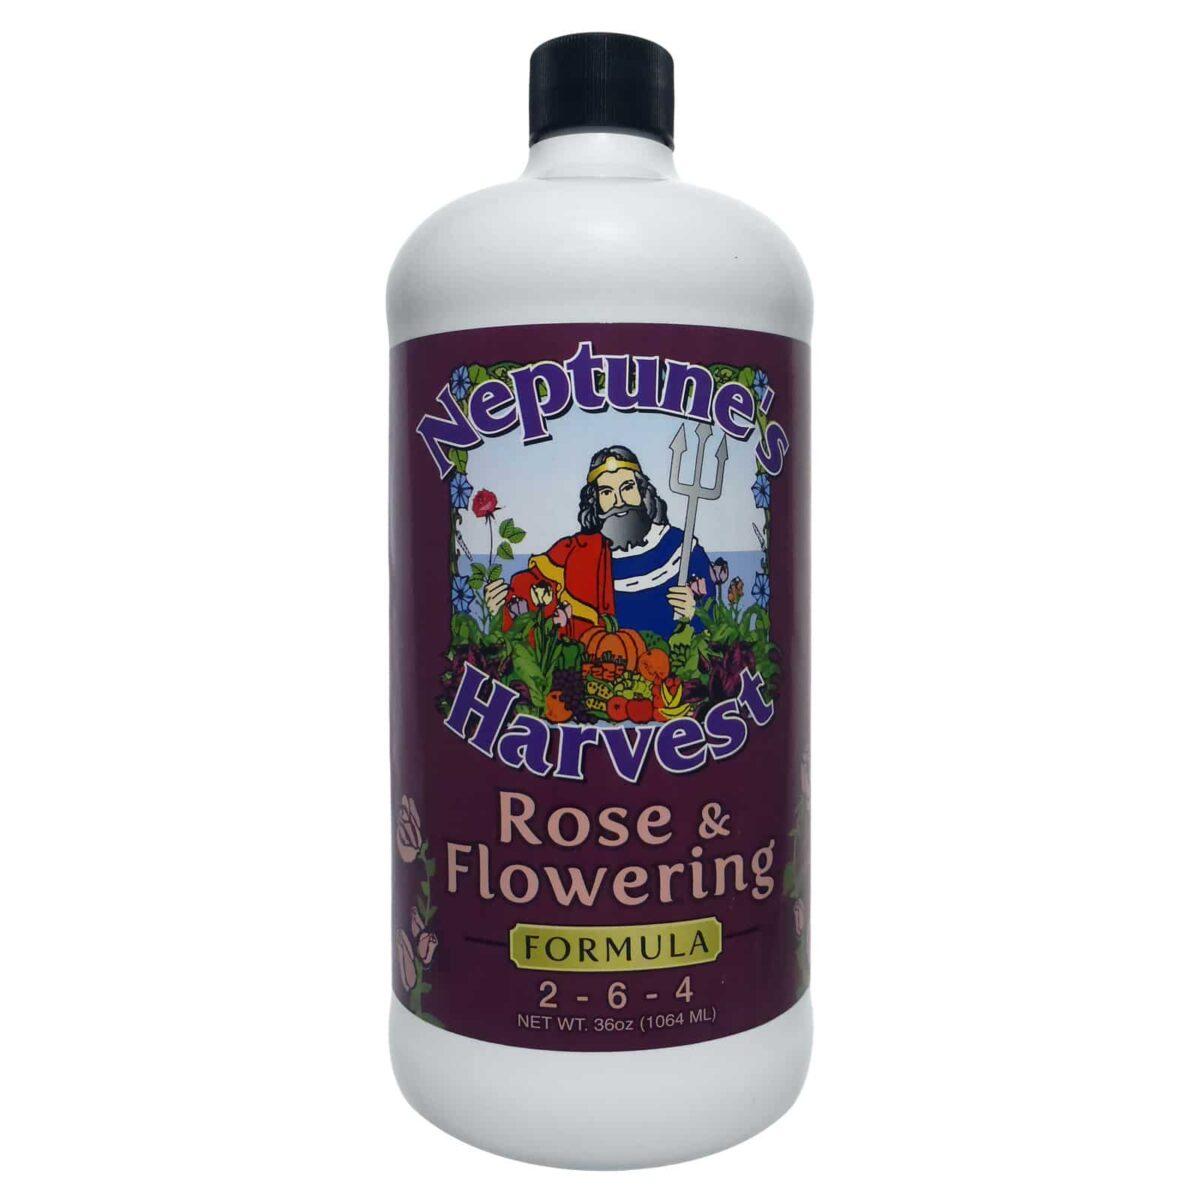 Rose & Flowering